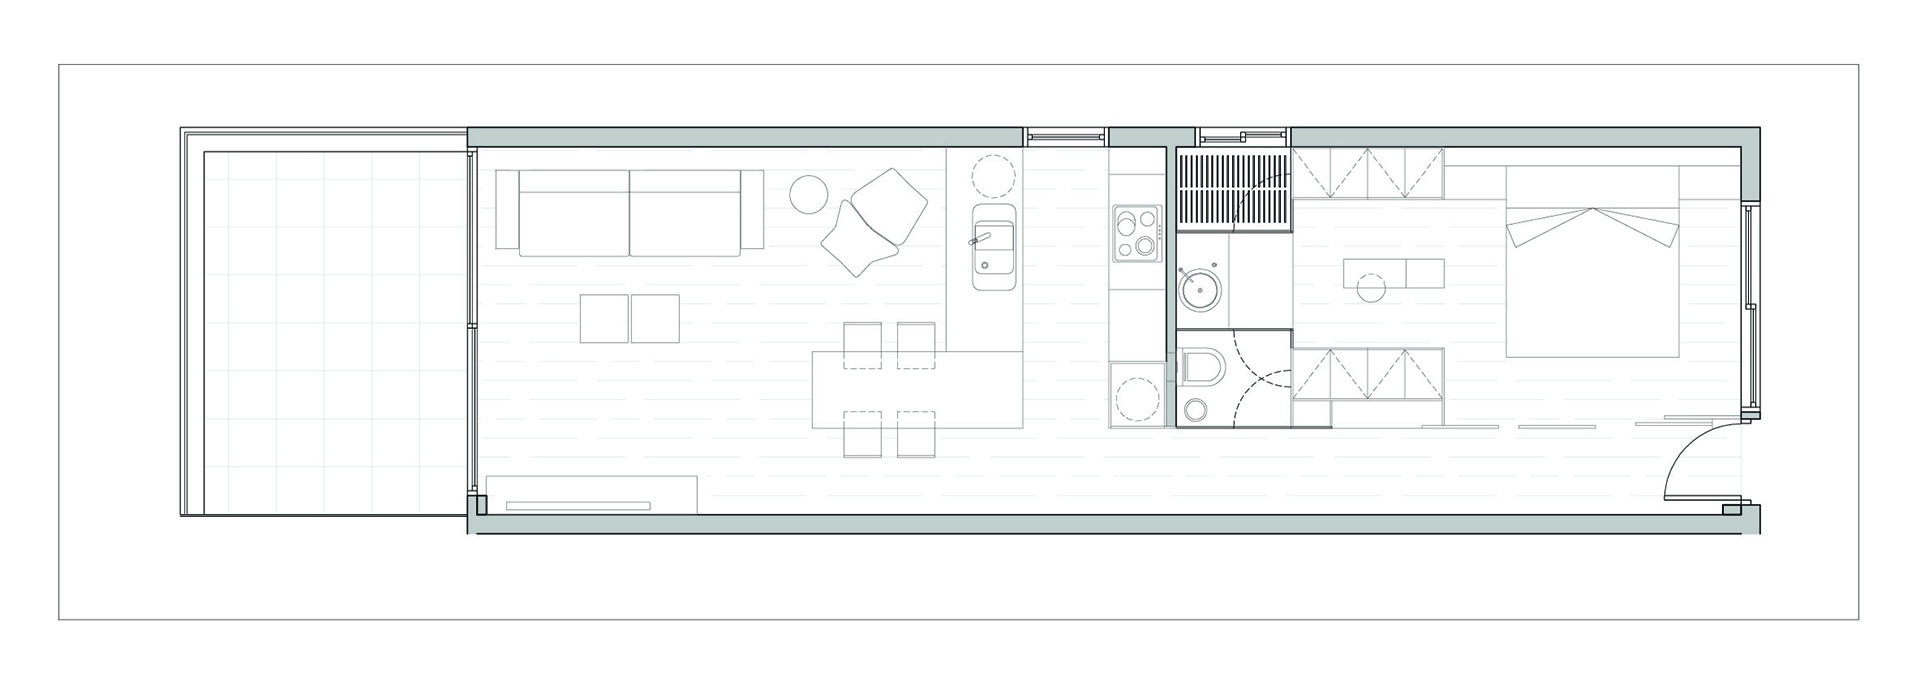 9_plan_site-Model